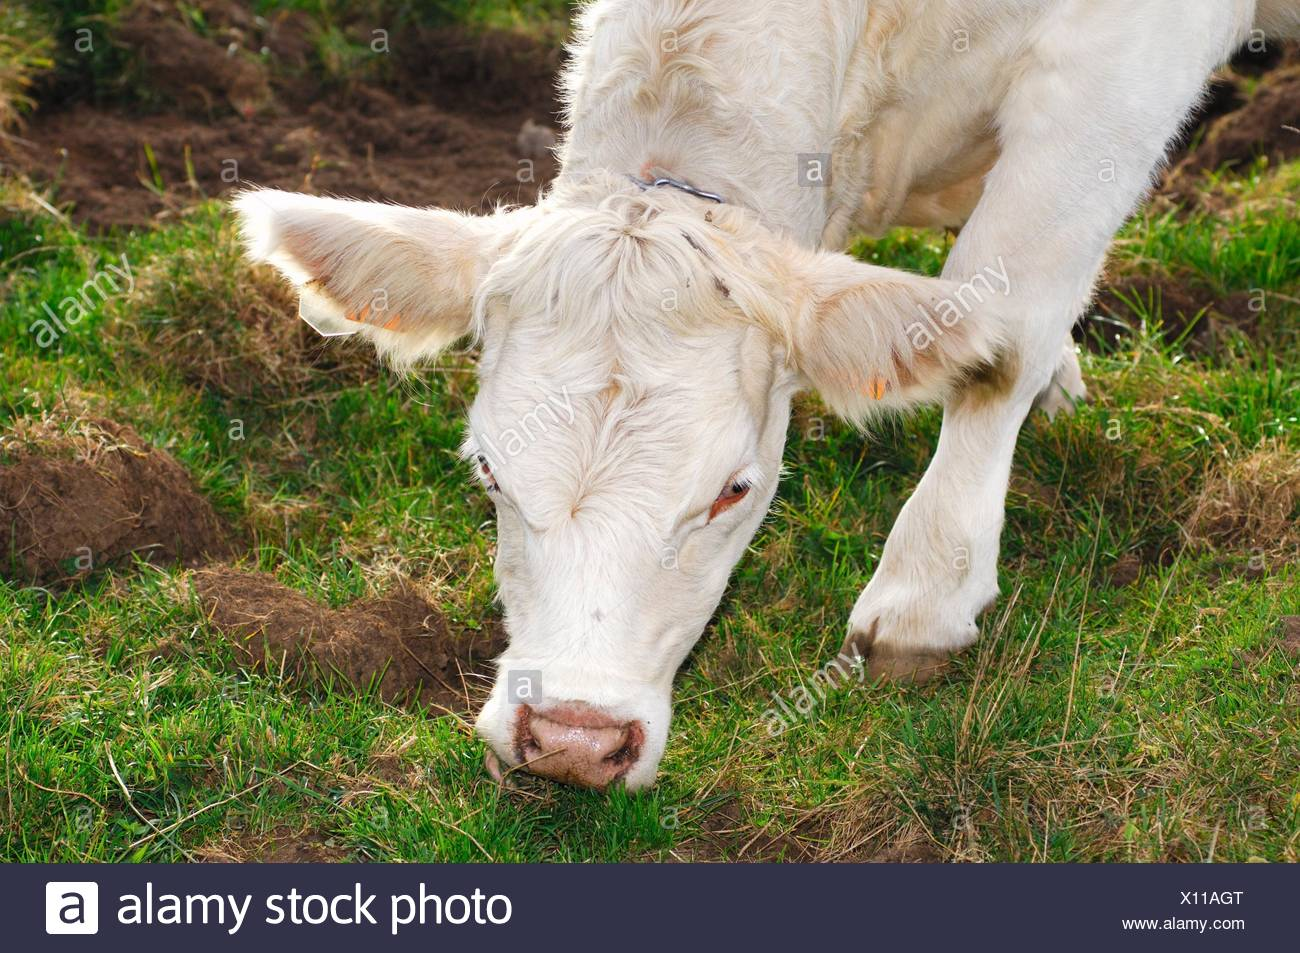 Charolais fattening bull, France - Stock Image